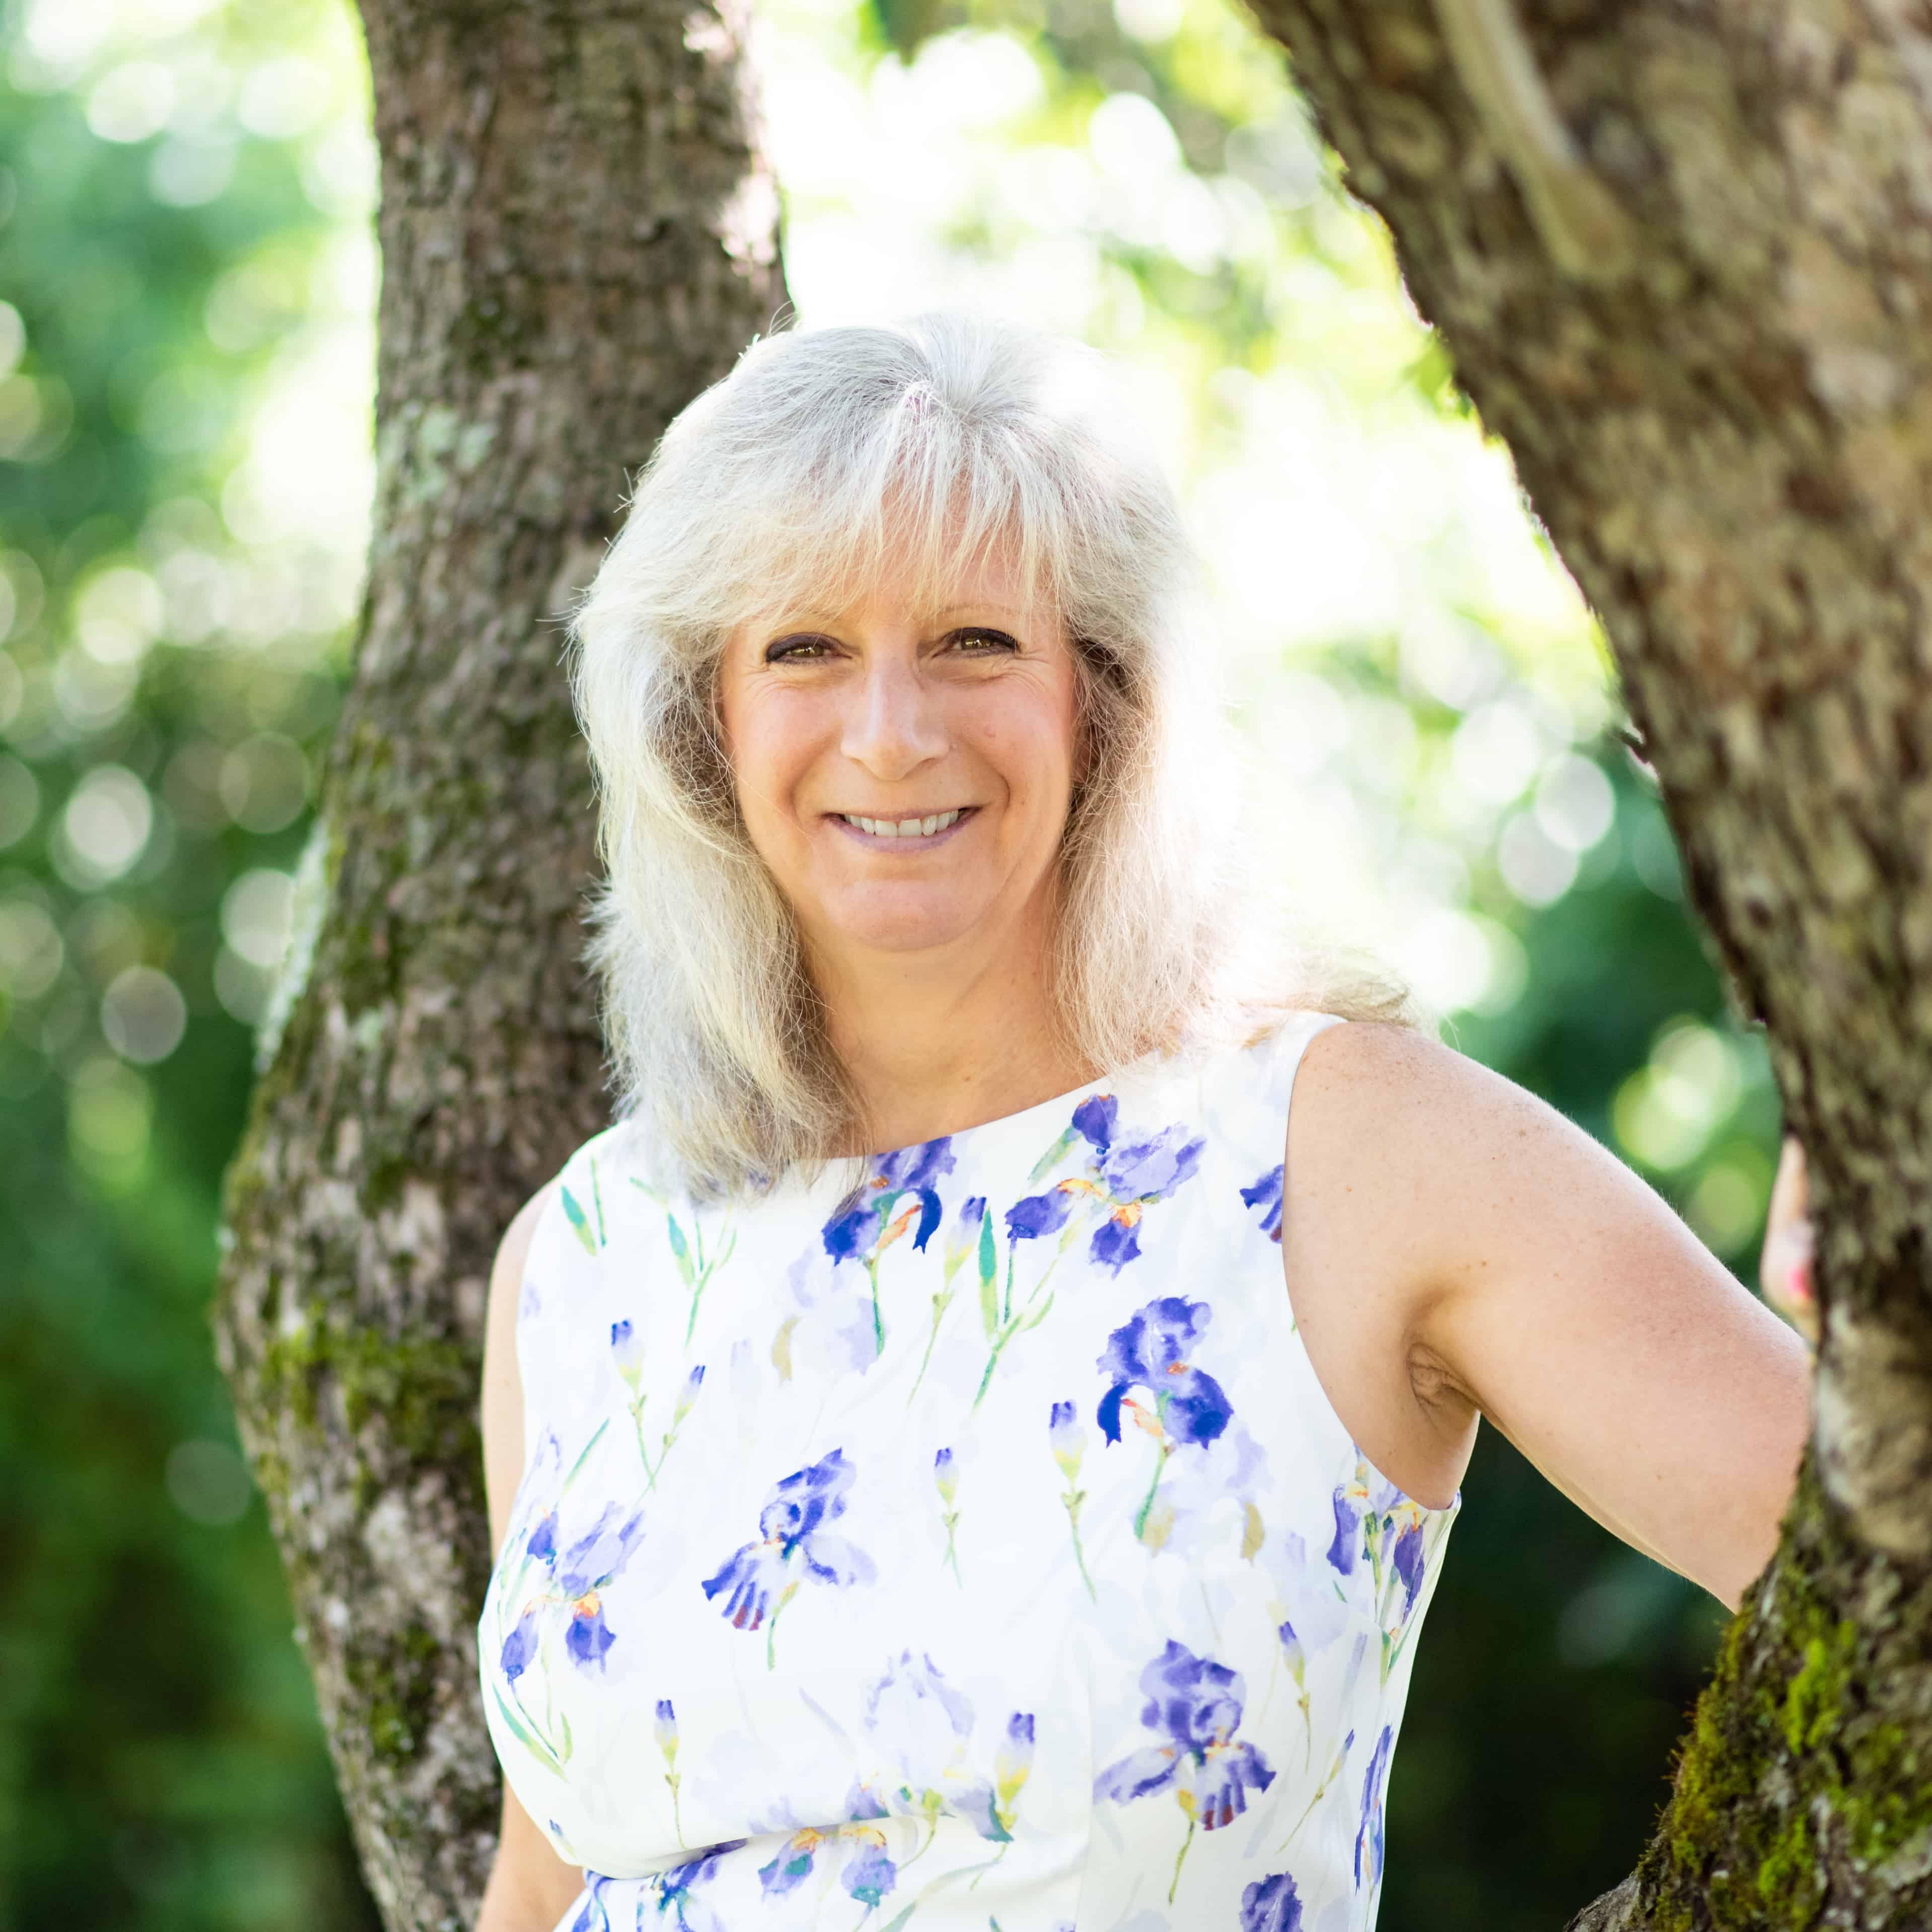 Christy Goodhue Mank